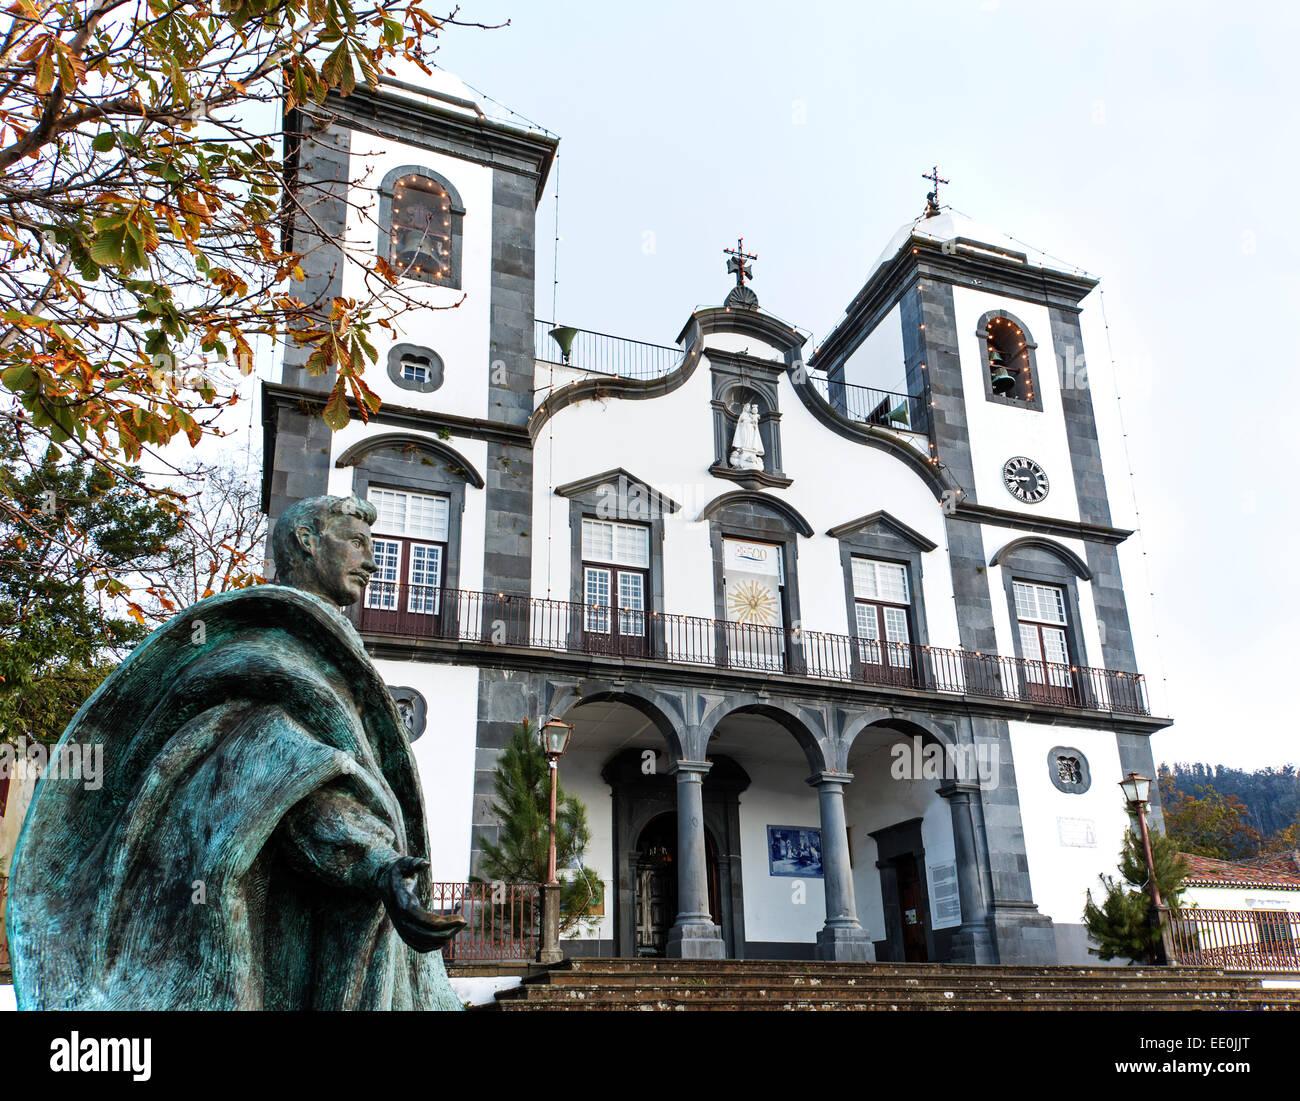 Nossa Senhora do Monte church, Funchal - Stock Image